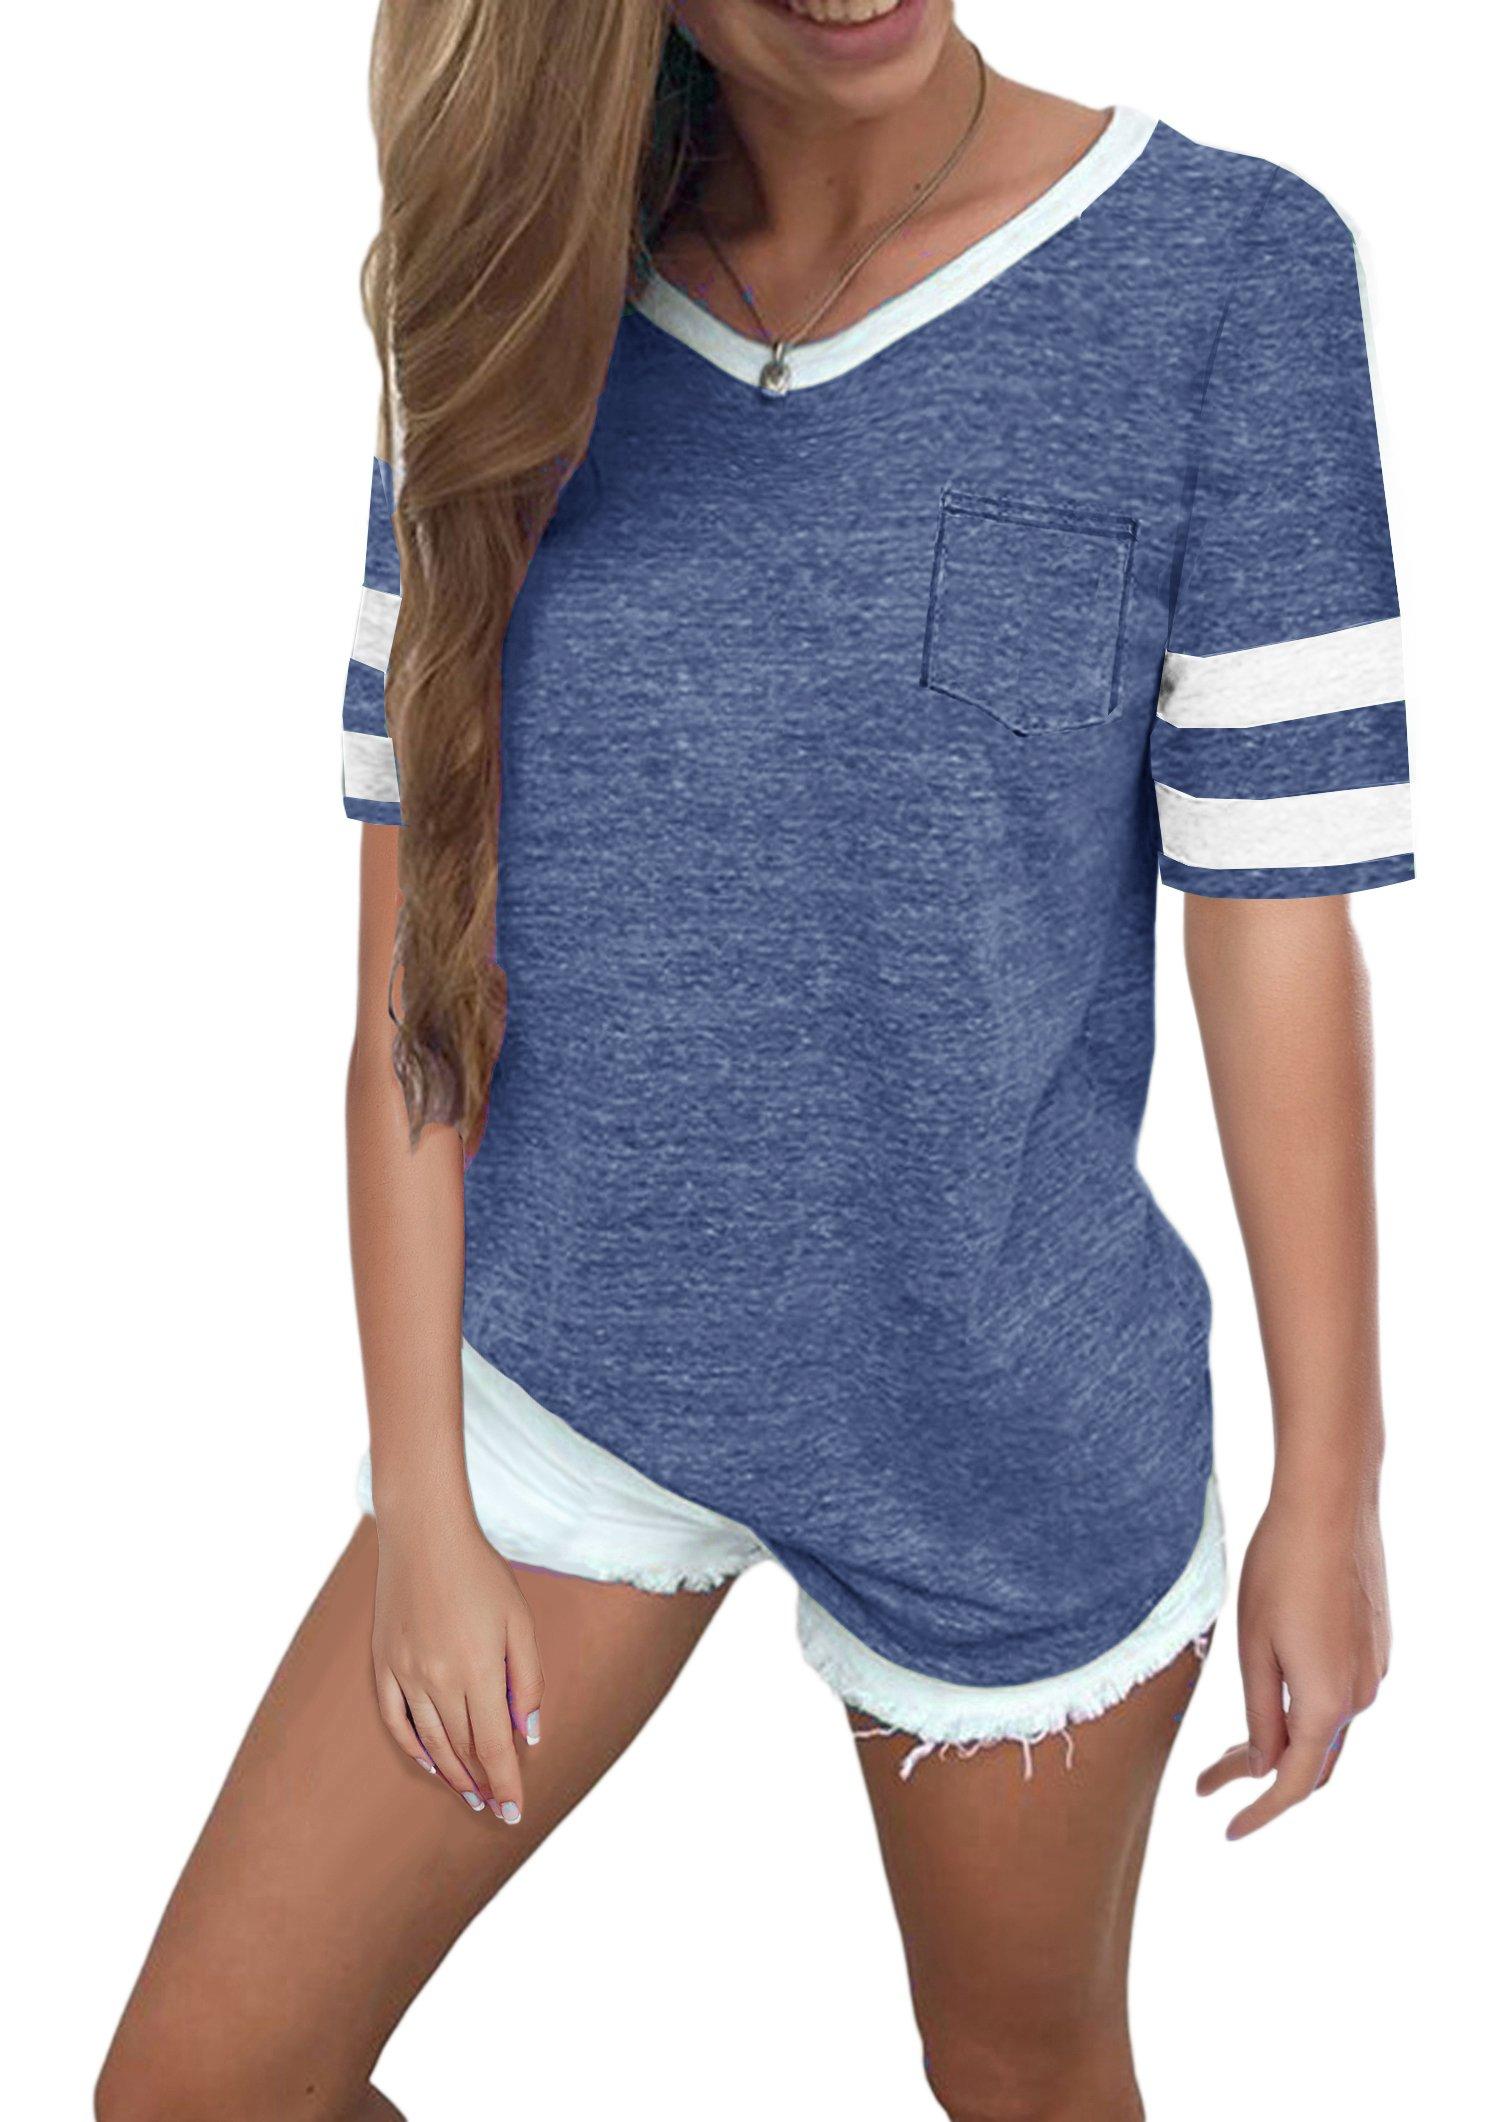 Twotwowin Women's Summer Tops Casual Cotton V Neck Sport T Shirt Short Sleeve Blouse(bl-m)